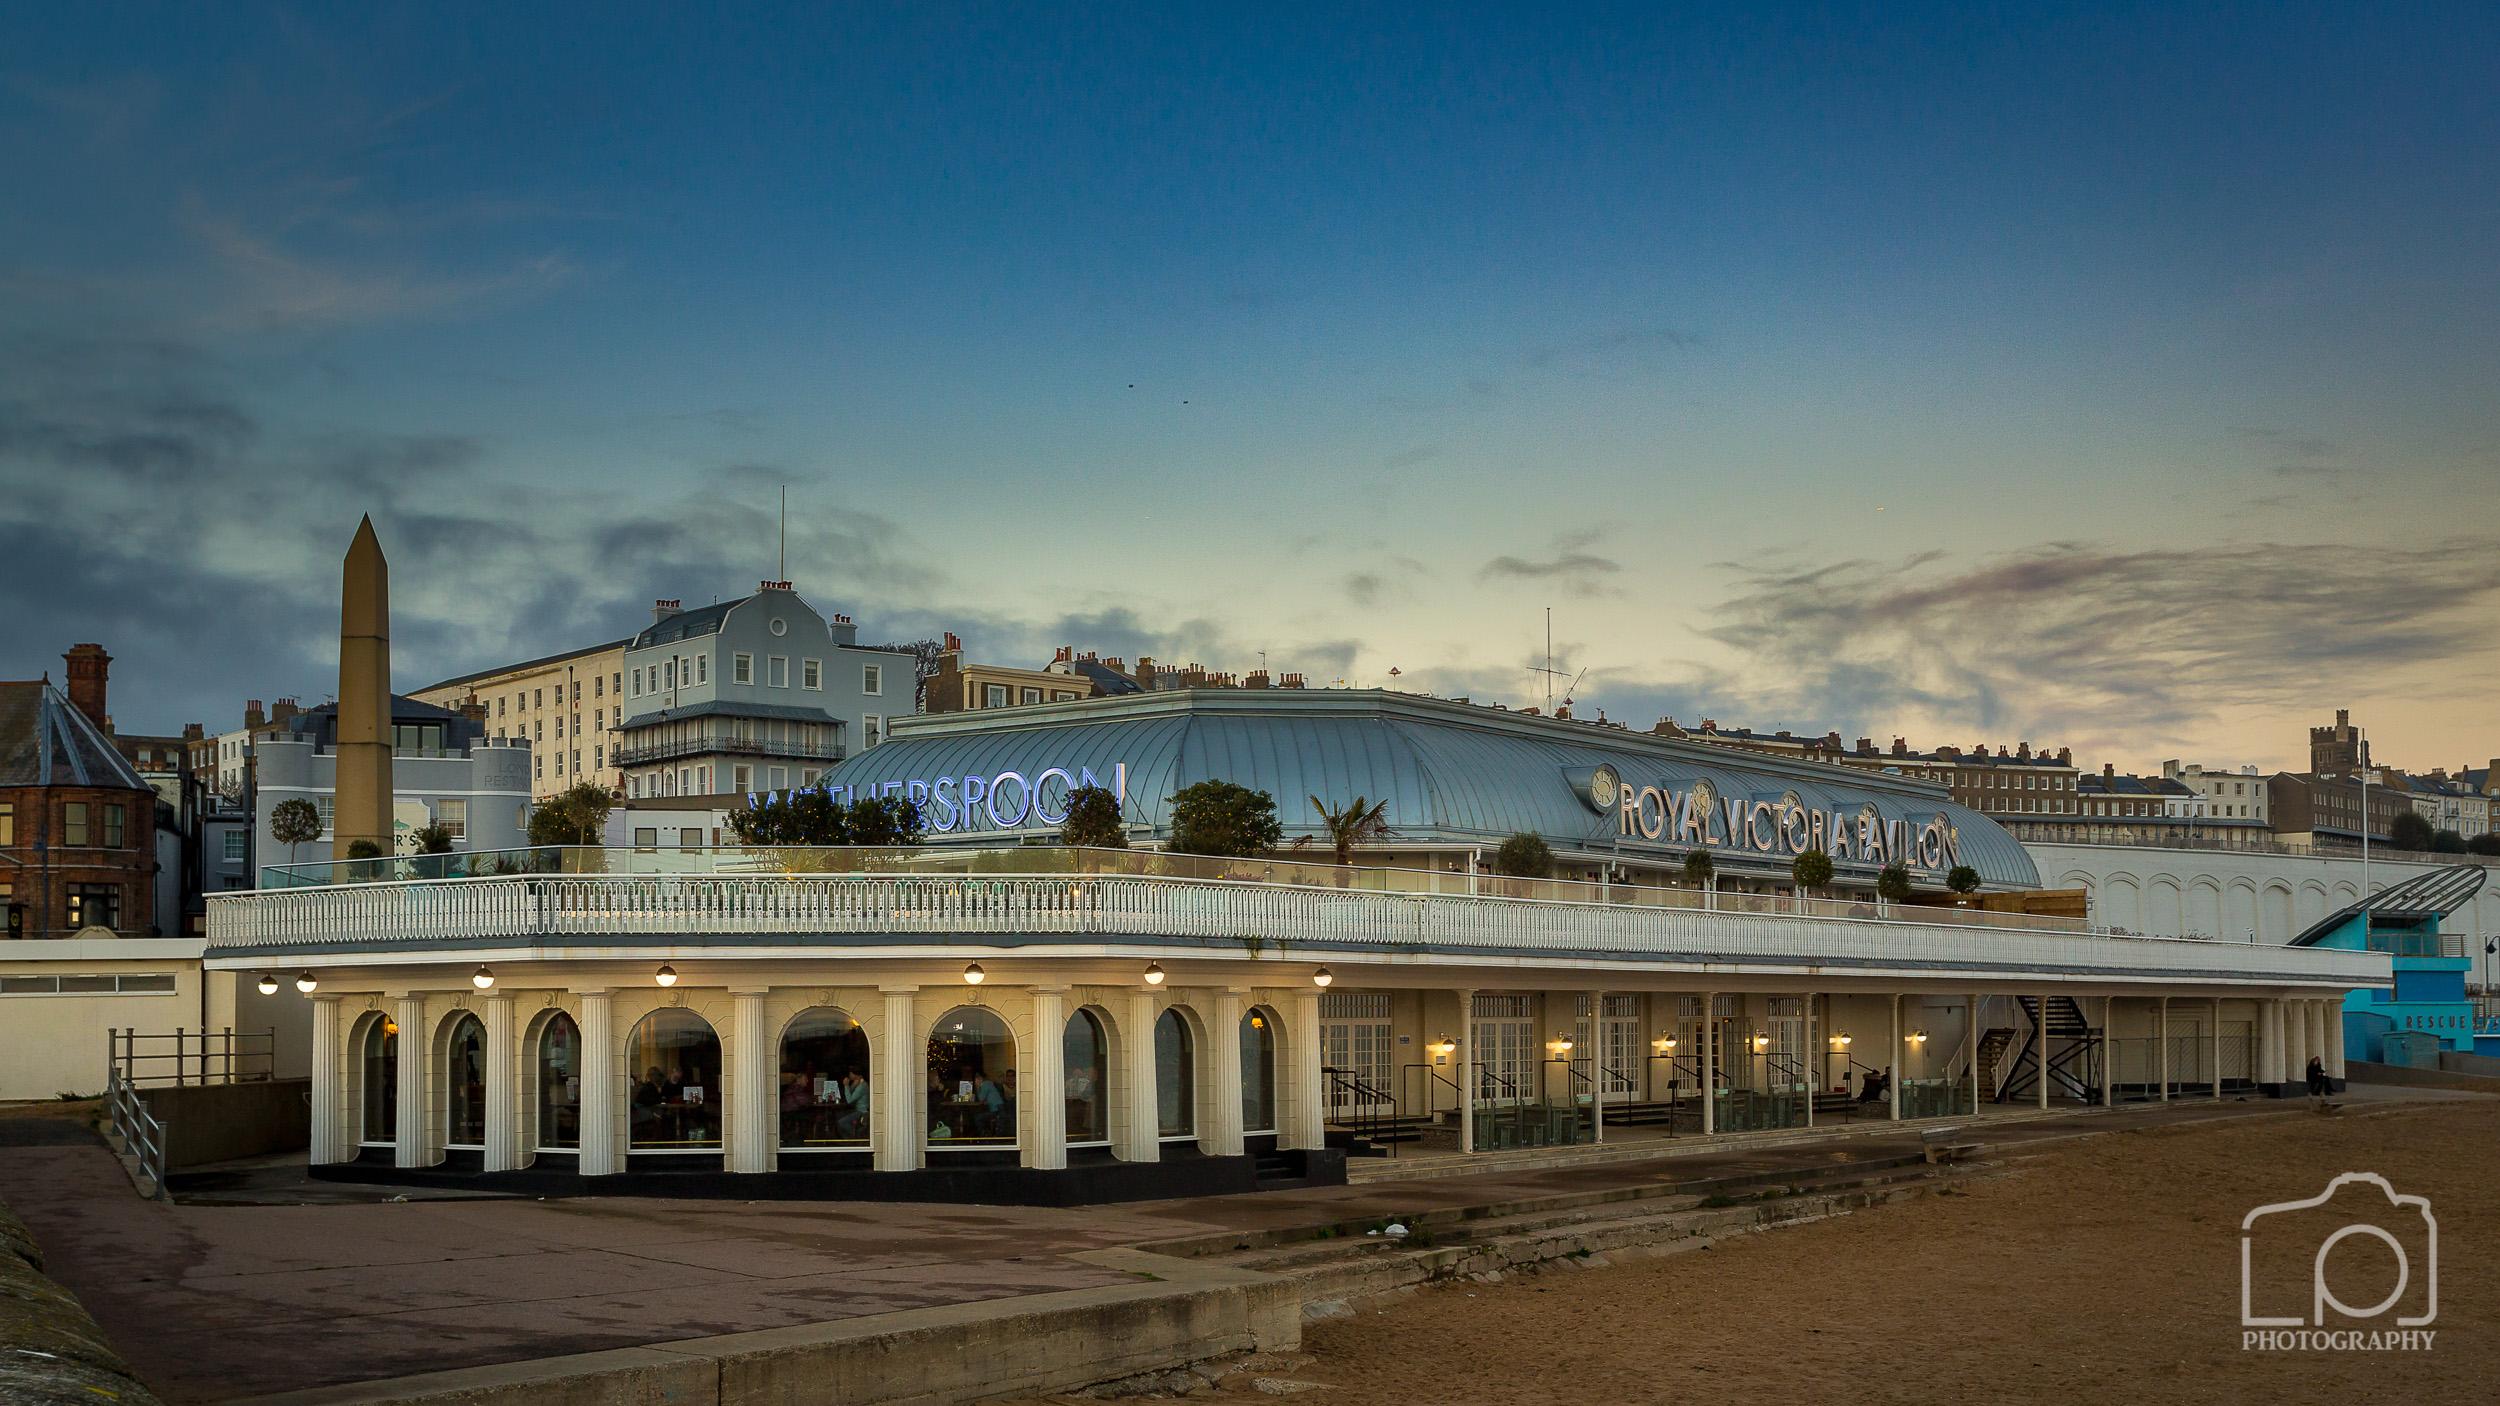 Wetherspoons Royal Victoria Pavilion - 0775